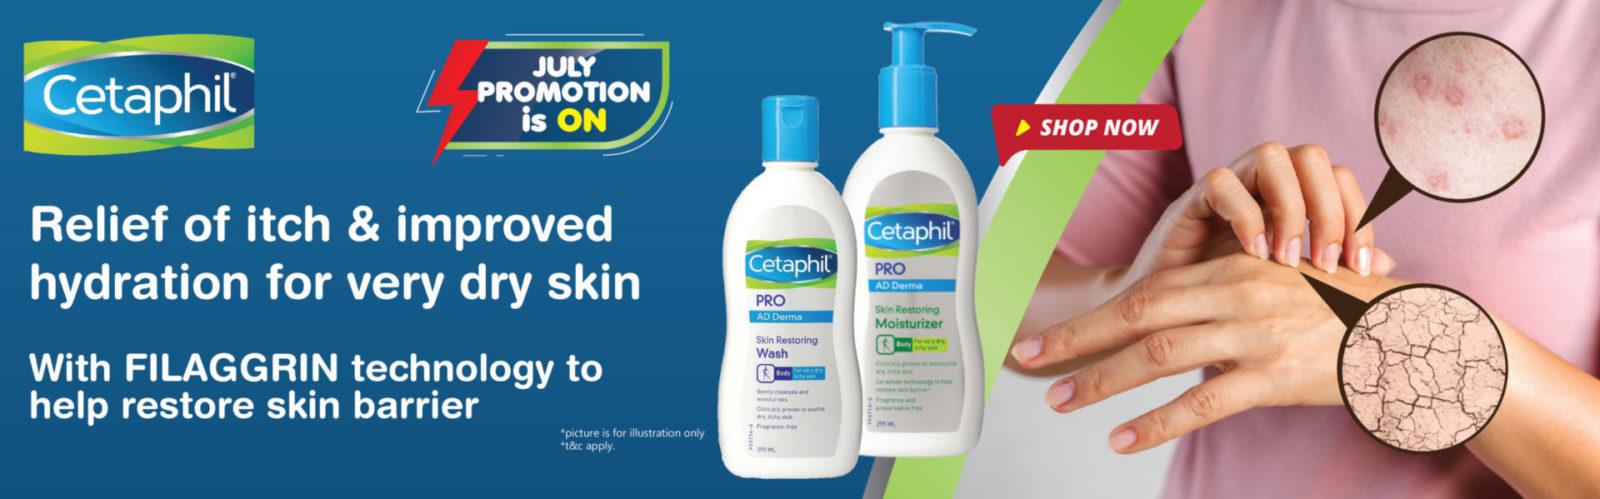 Alpro Pharmacy One Click Cetaphil range july promotion-01